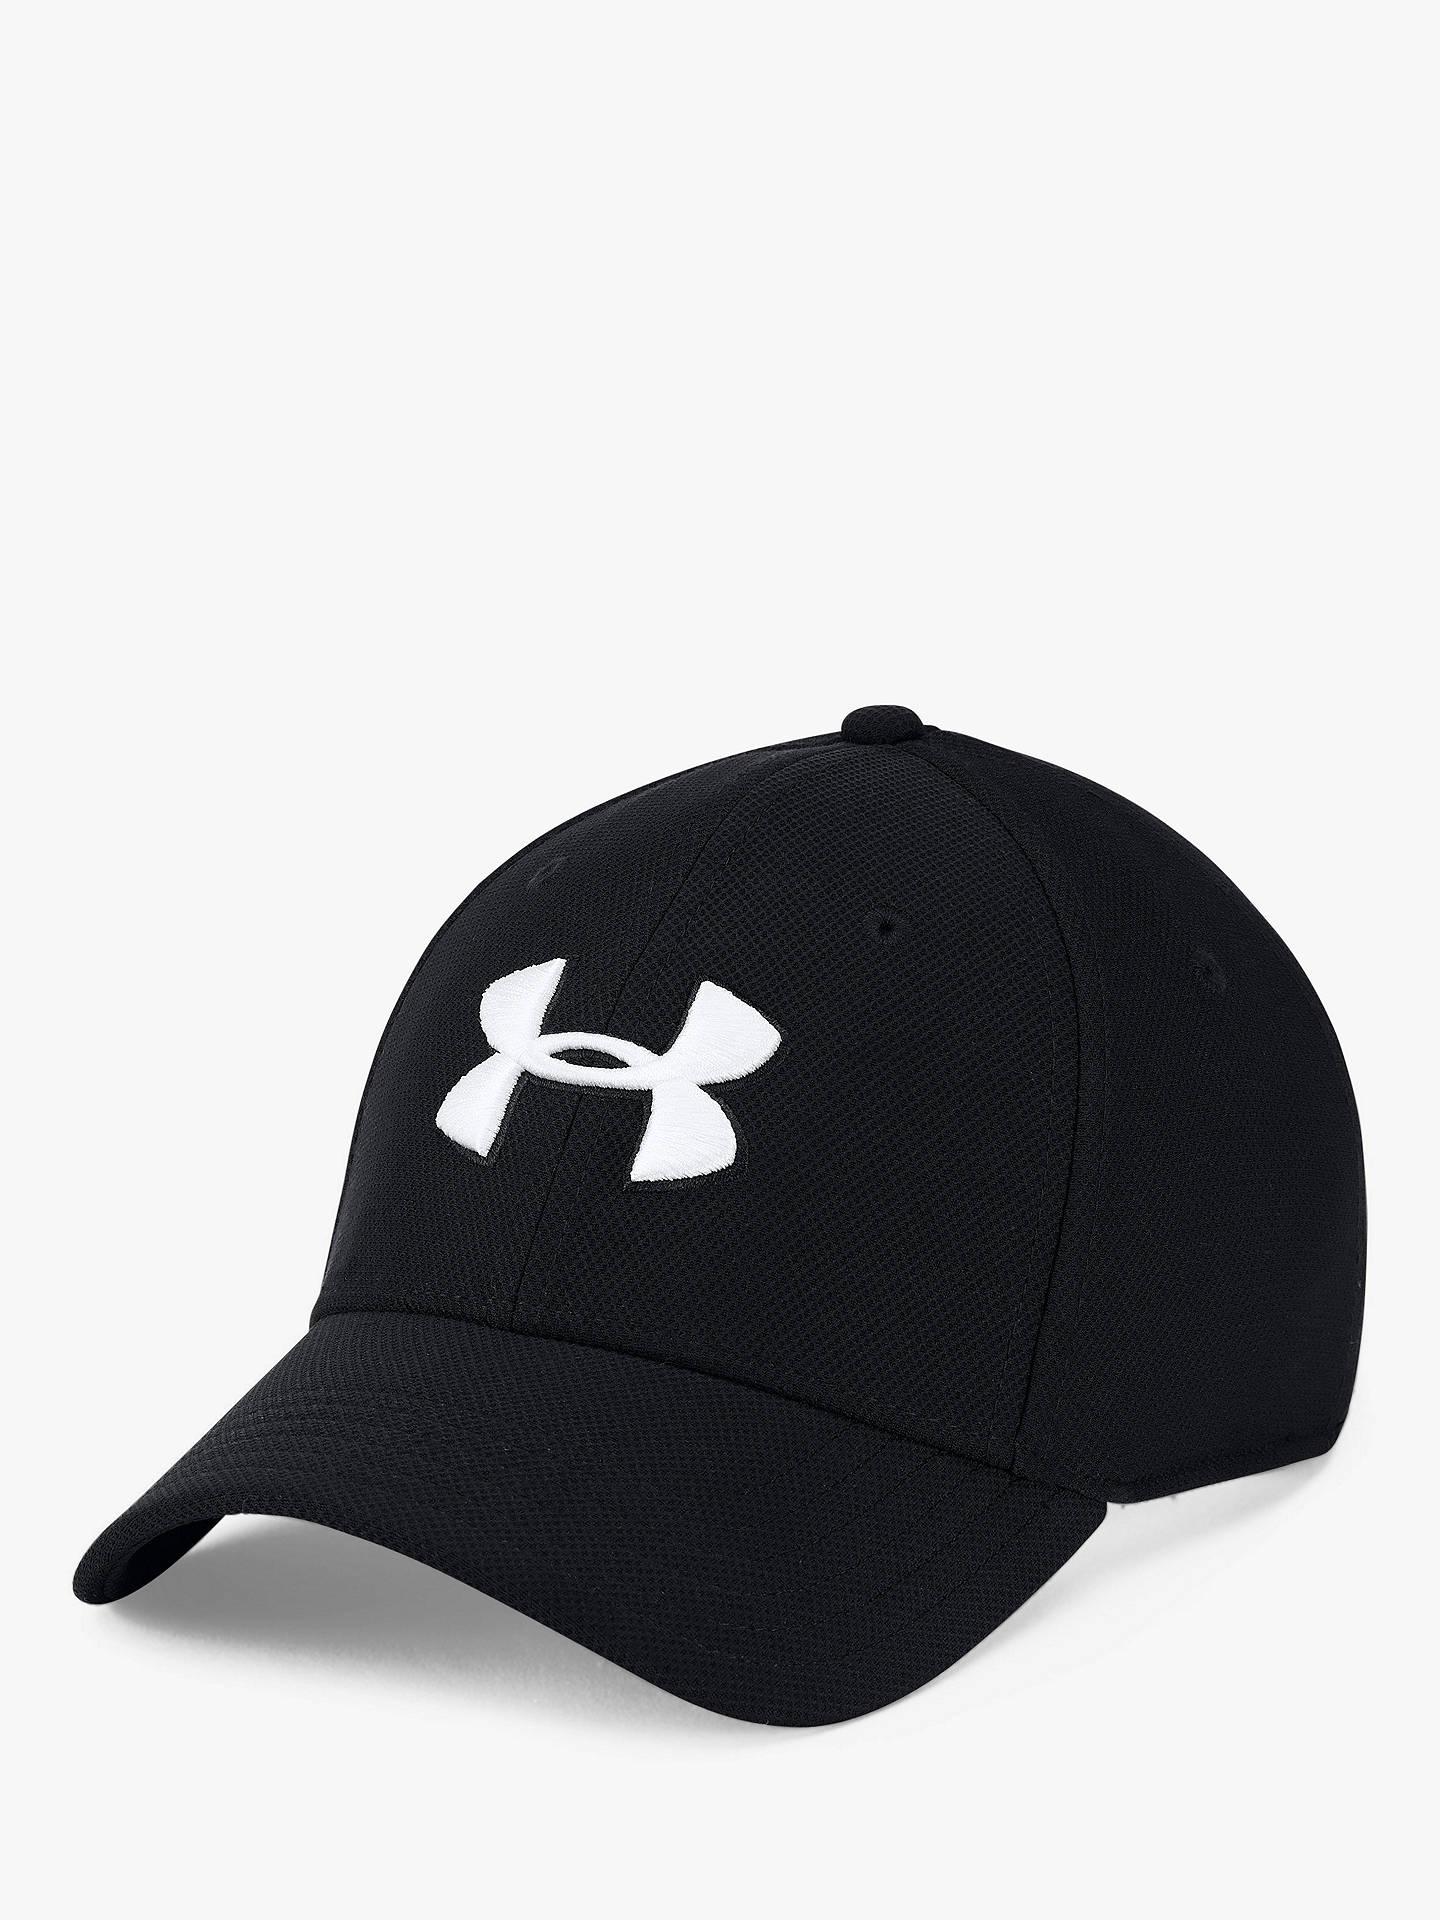 1fb49d41cd9 Buy Under Armour Blitzing 3.0 Baseball Cap